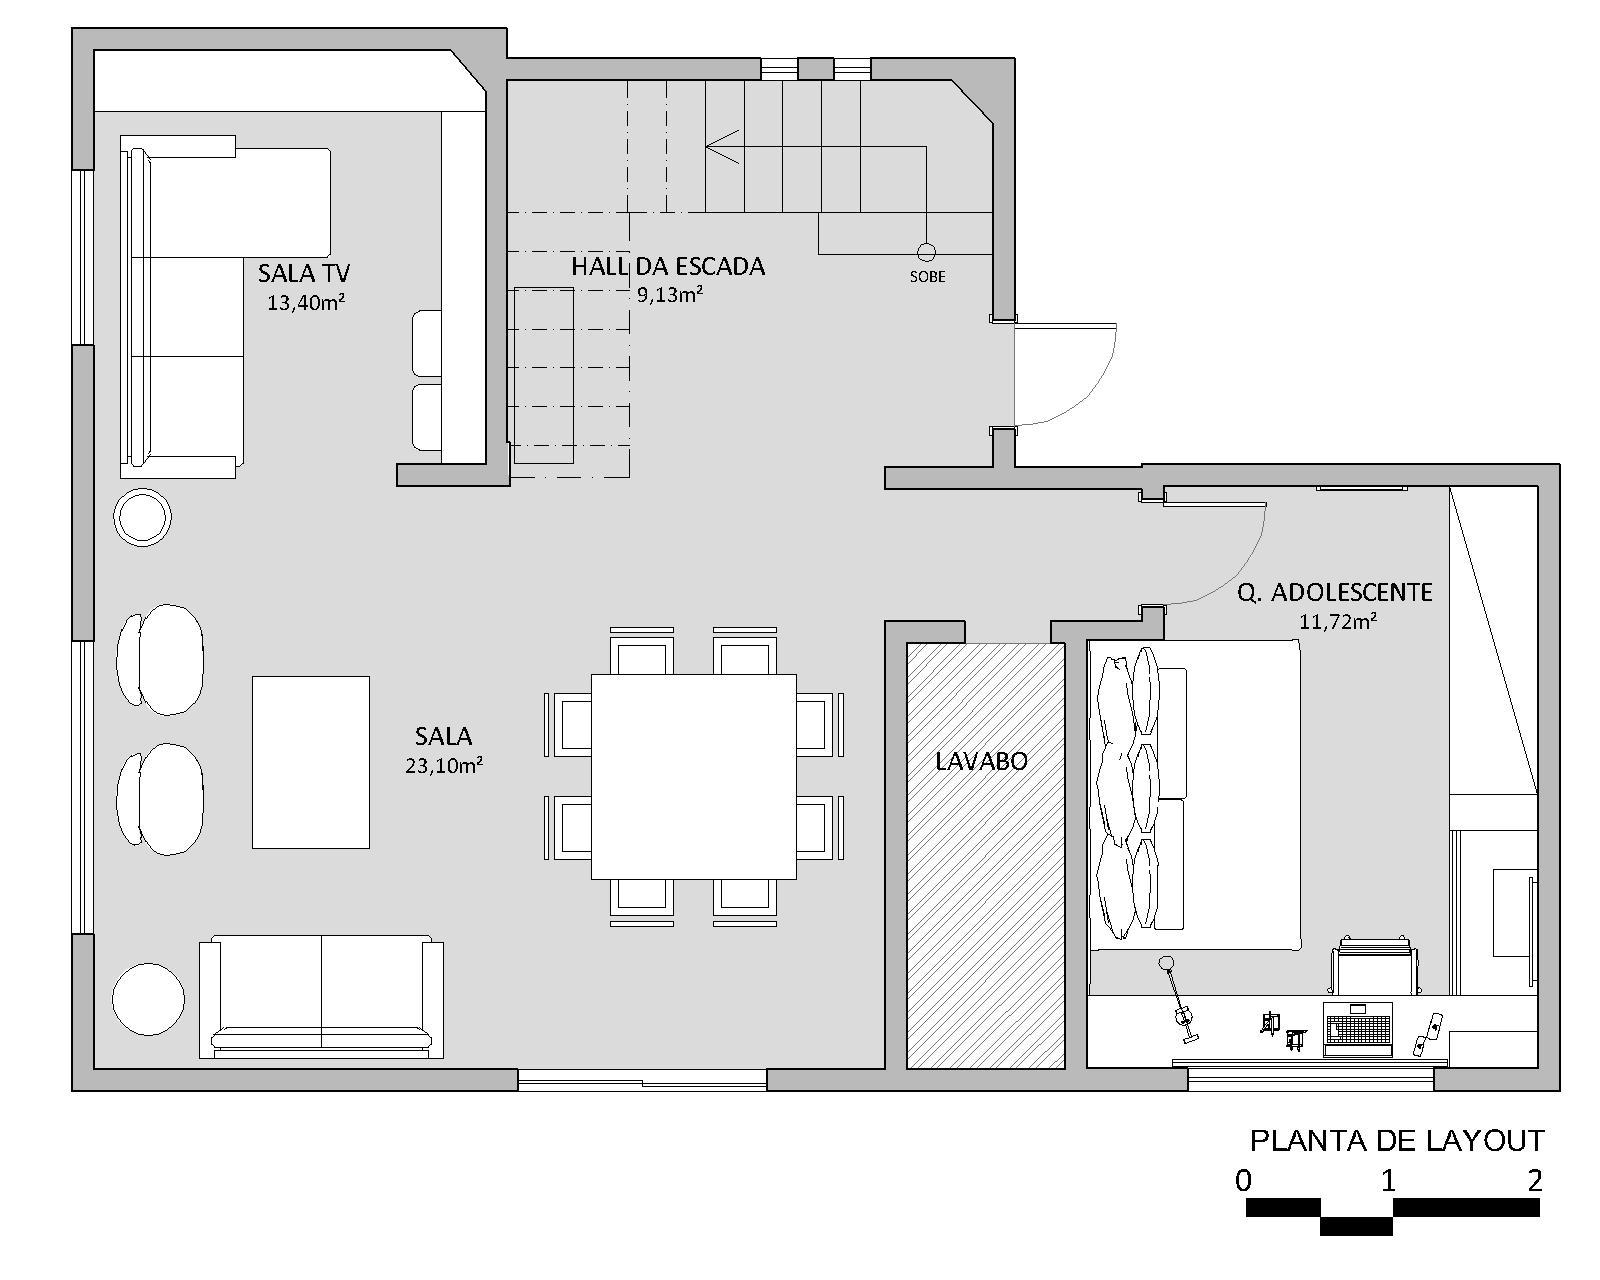 RFB_EP_Planta de layout Geral